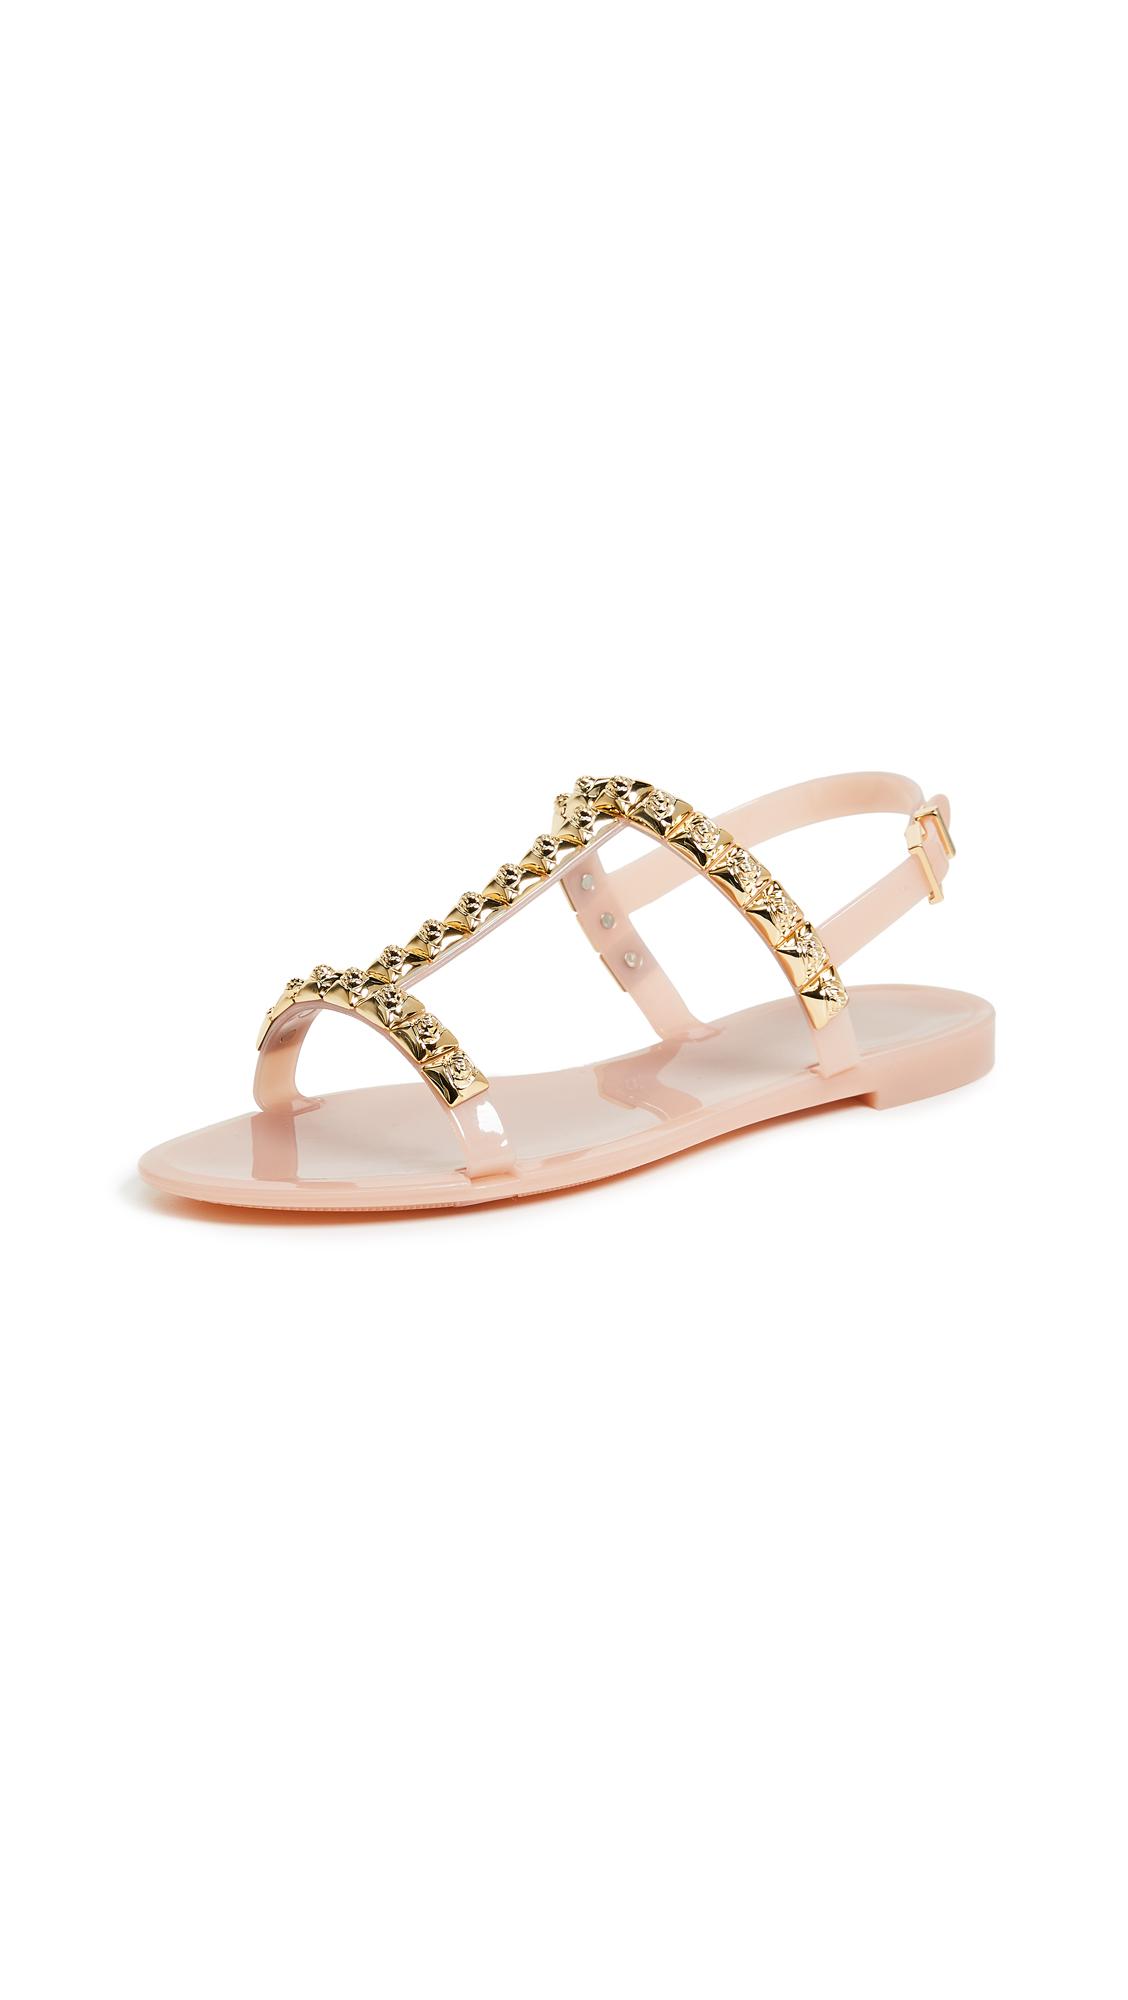 Stuart Weitzman Jelrose Sandals - Ballet